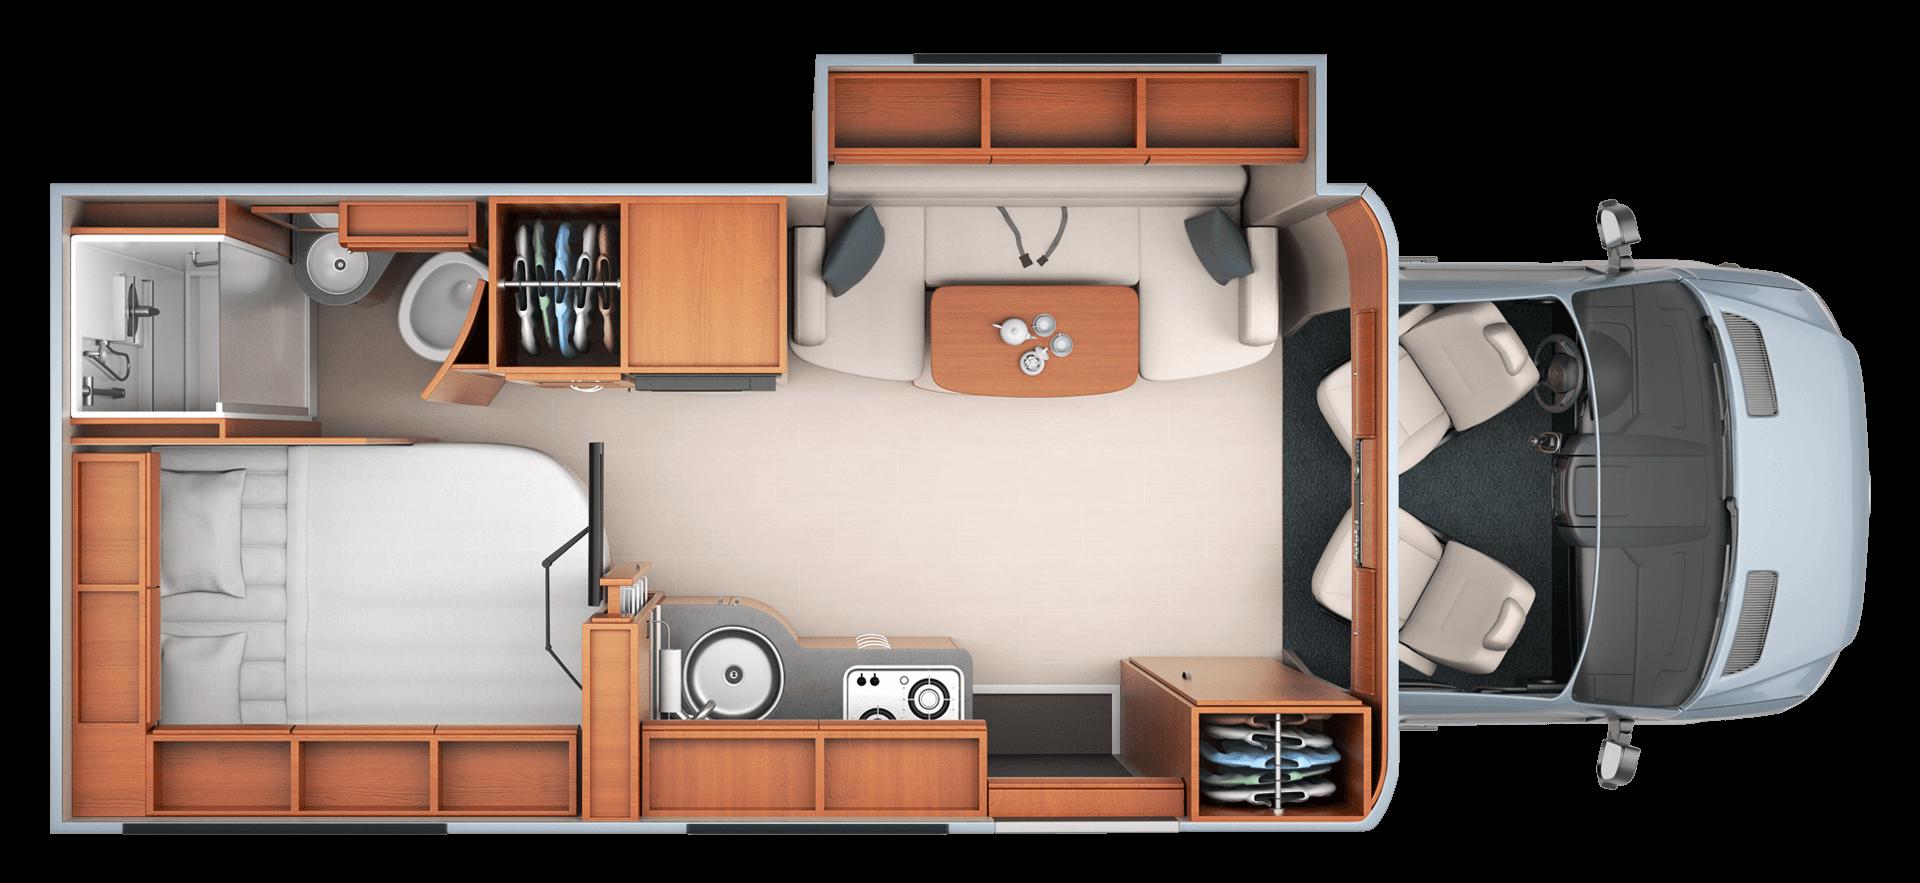 Unity - Floorplans   Unity, Leisure travel vans and Mercedes sprinter